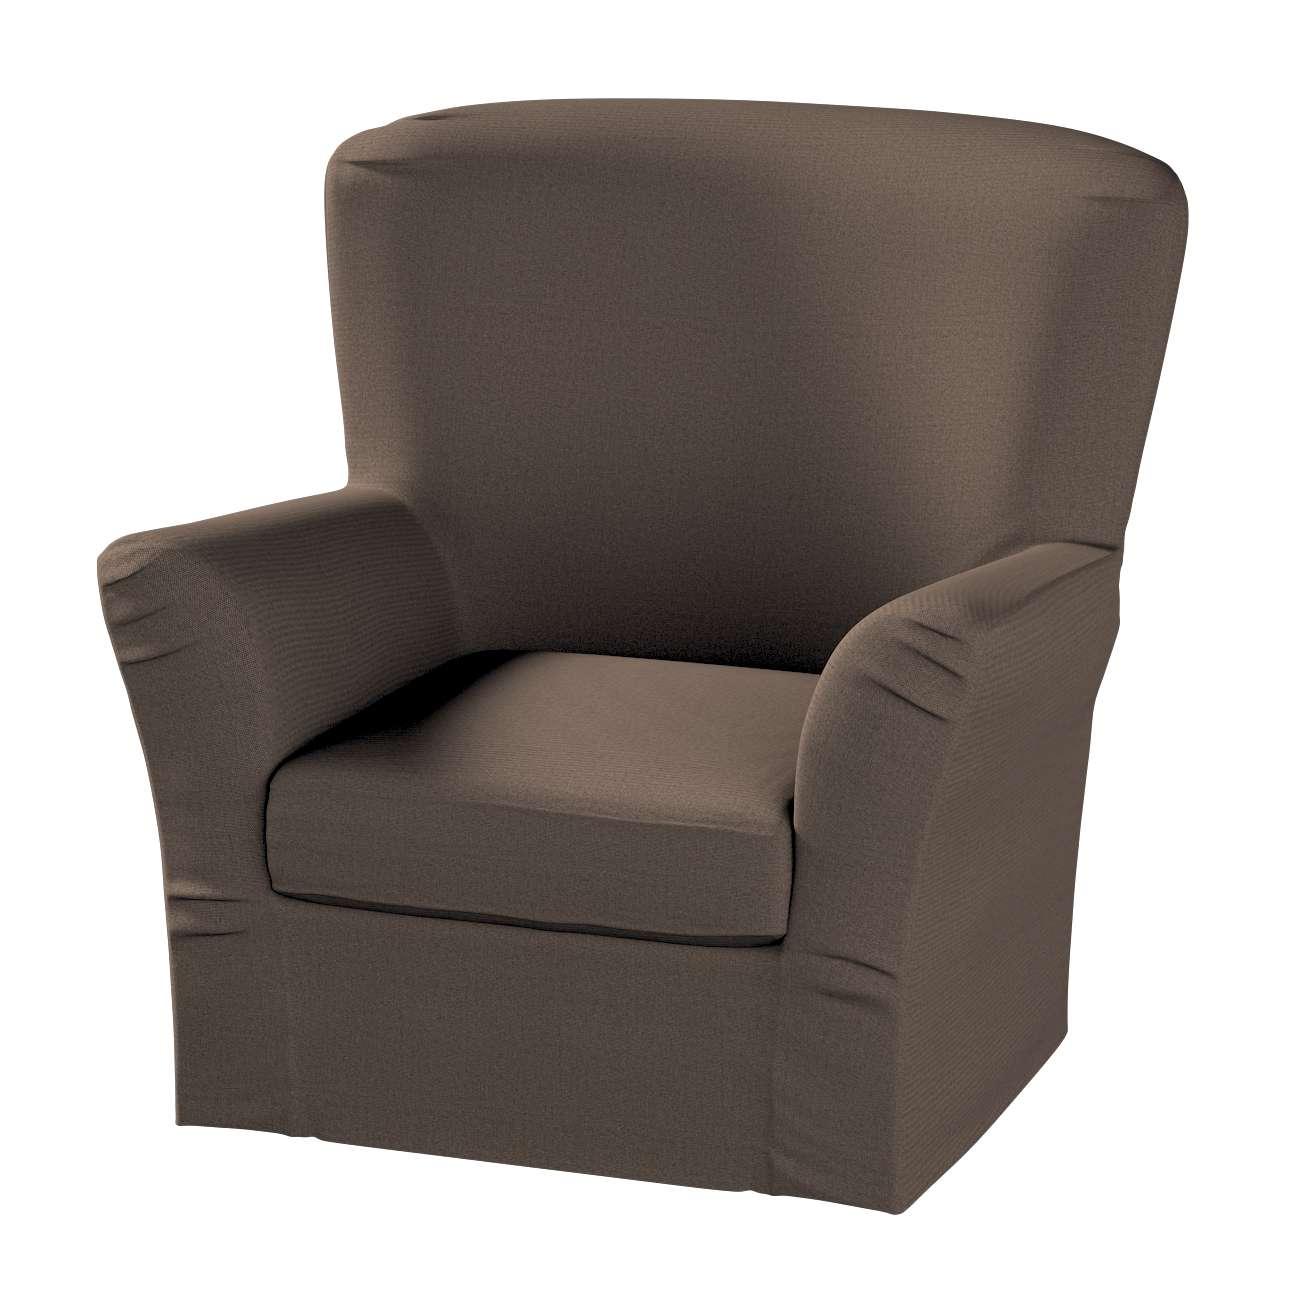 TOMELILLA fotelio užvalkalas TOMELILLA fotelis kolekcijoje Etna , audinys: 705-08